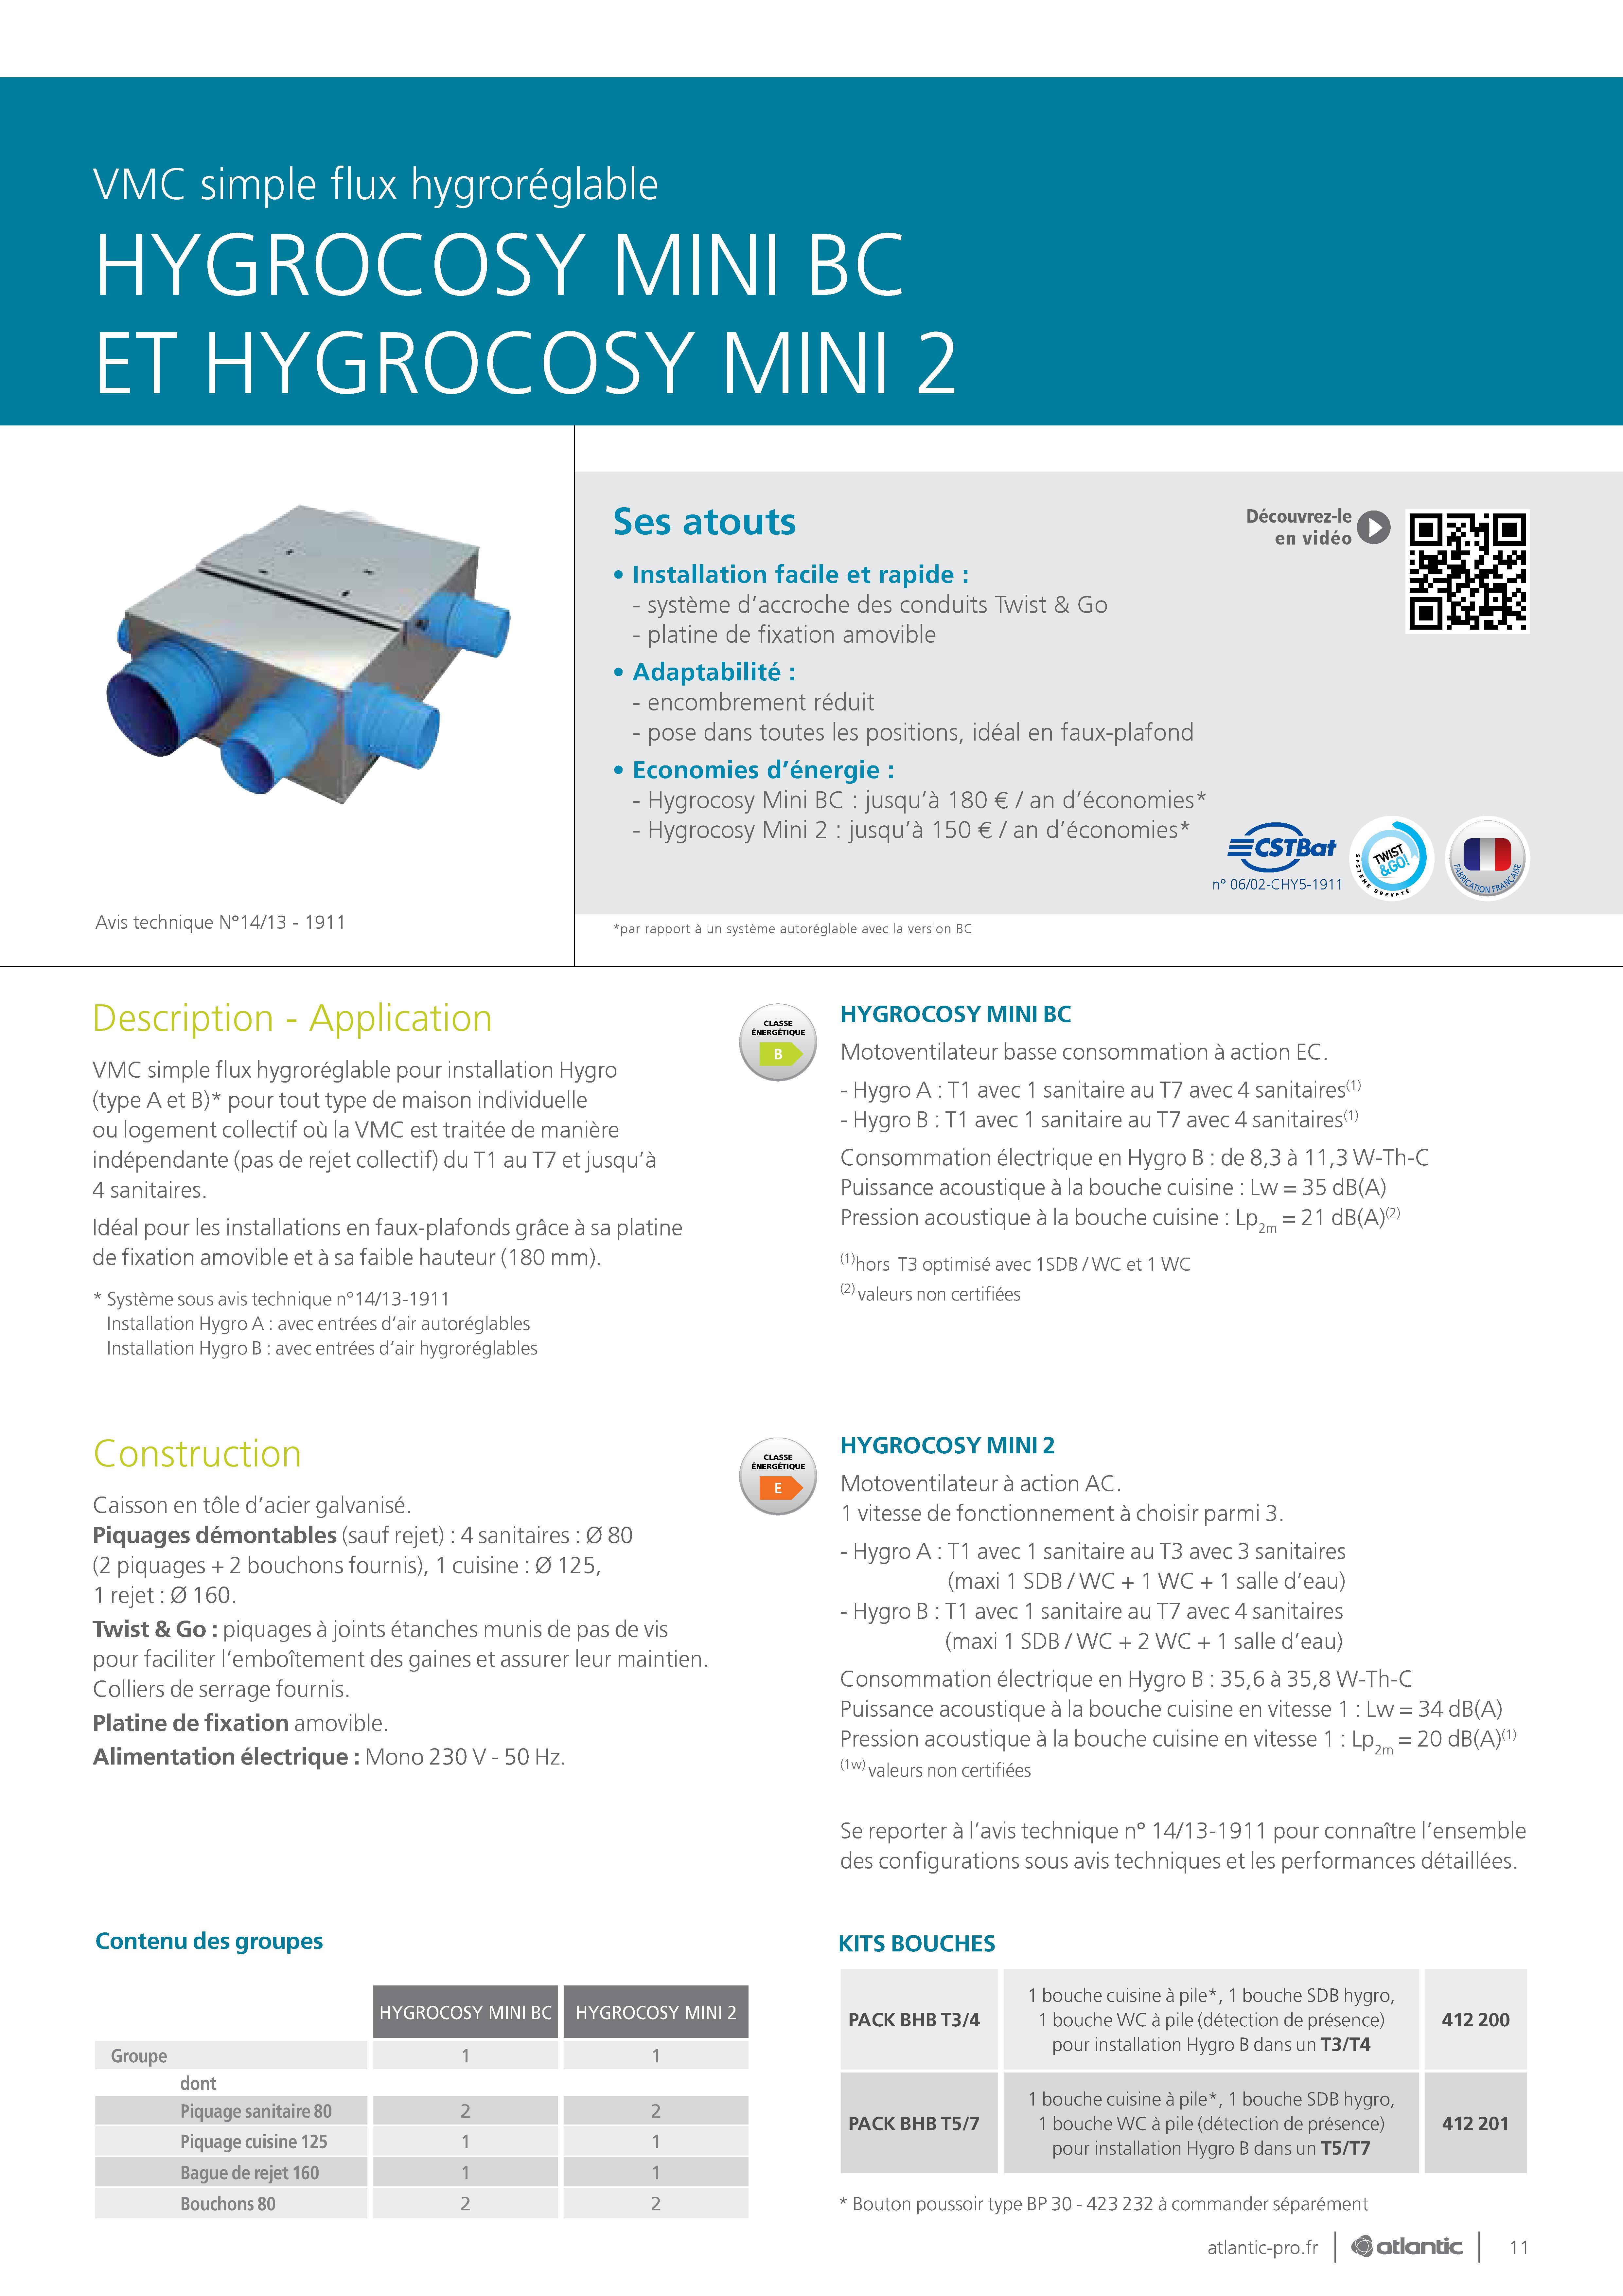 HYGROCOSY MINI BC (1)